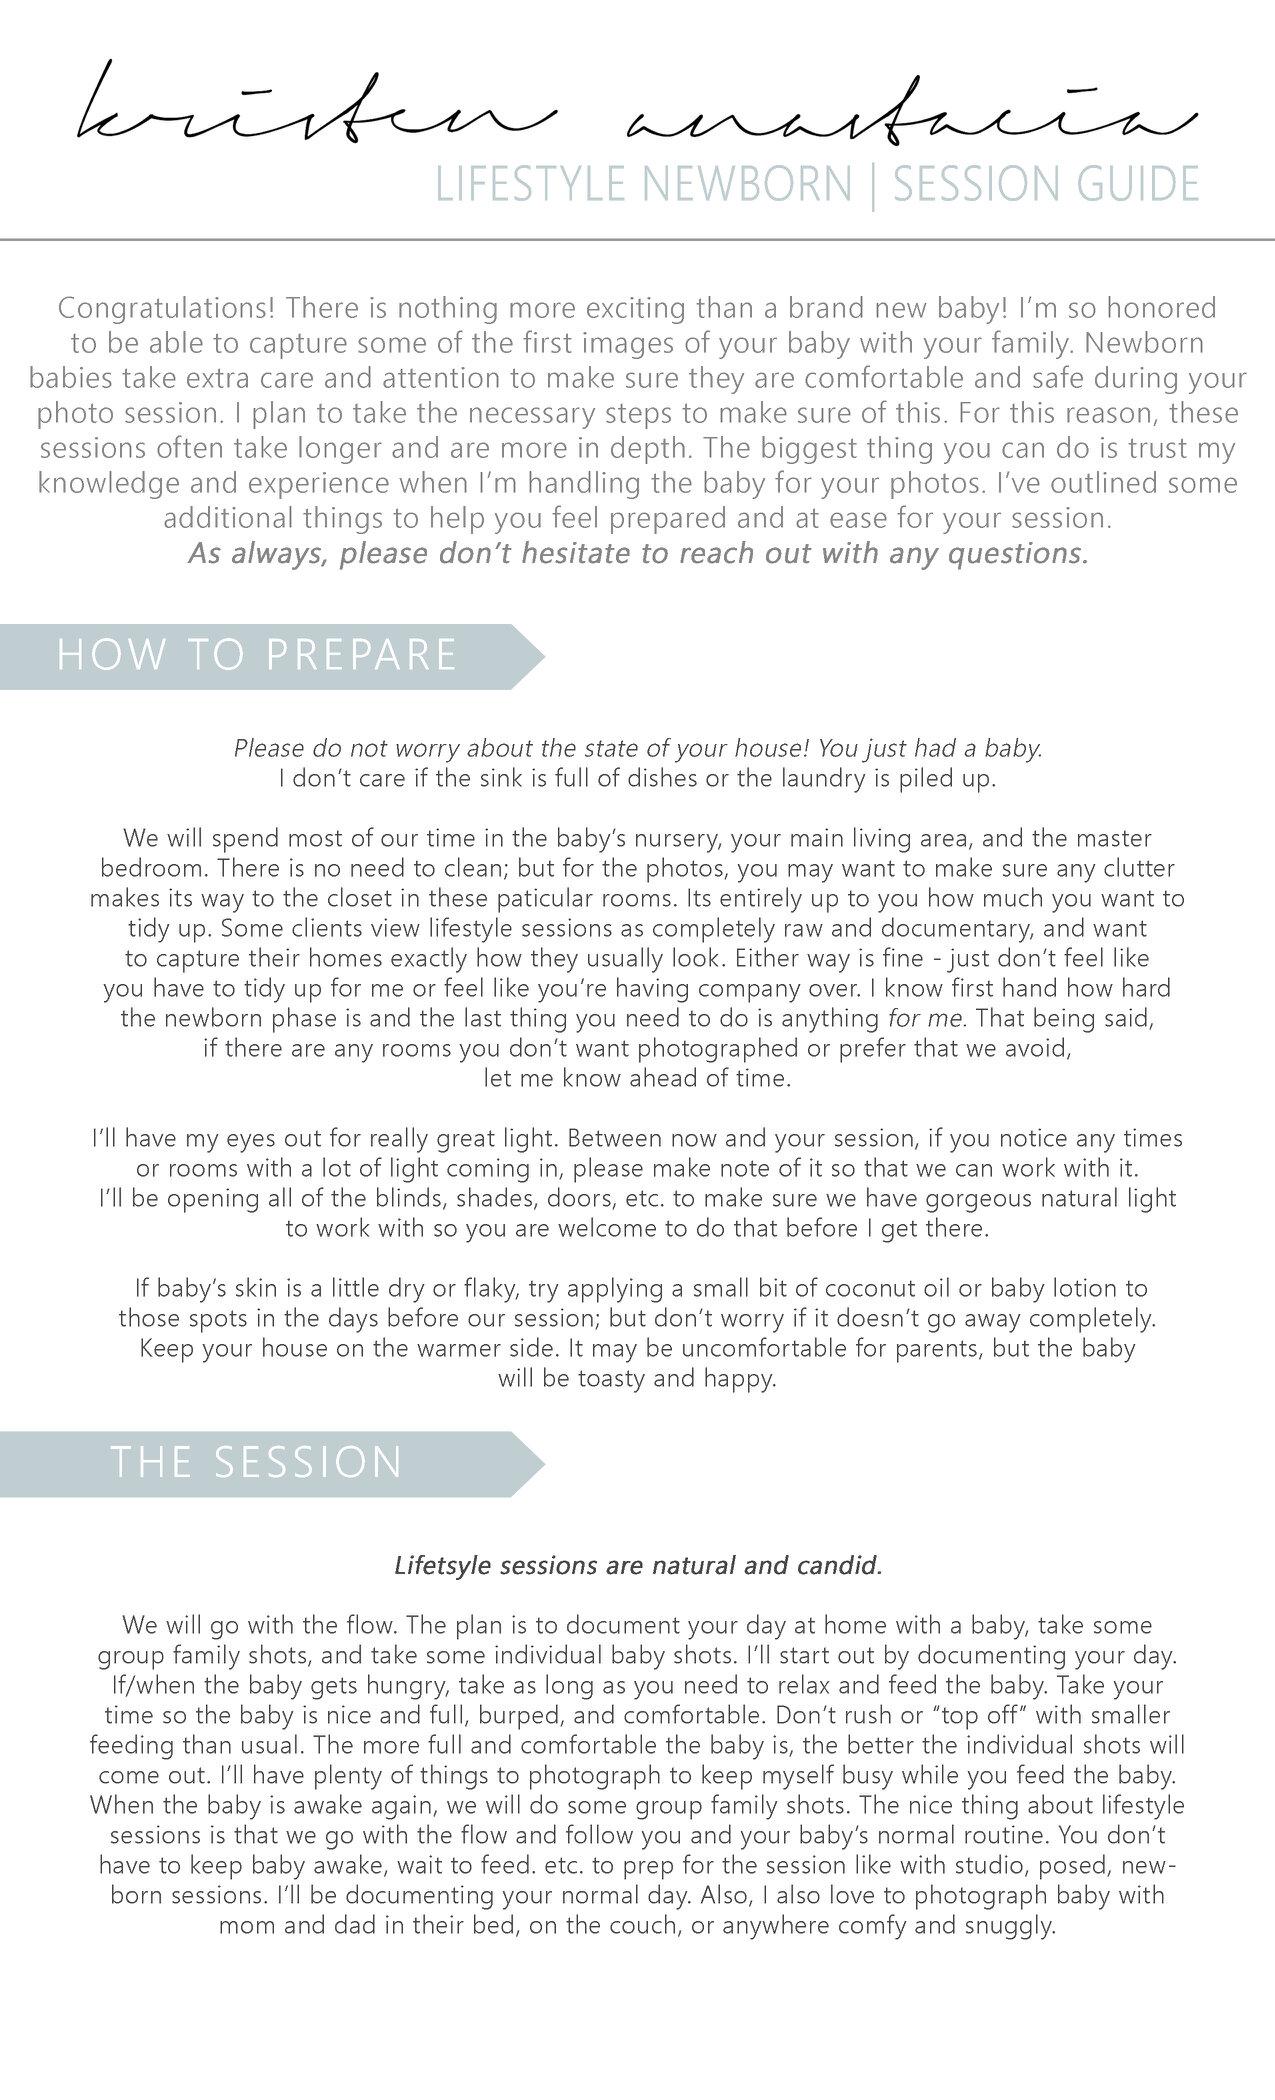 Lifestyle Newborn Session Guide.jpg